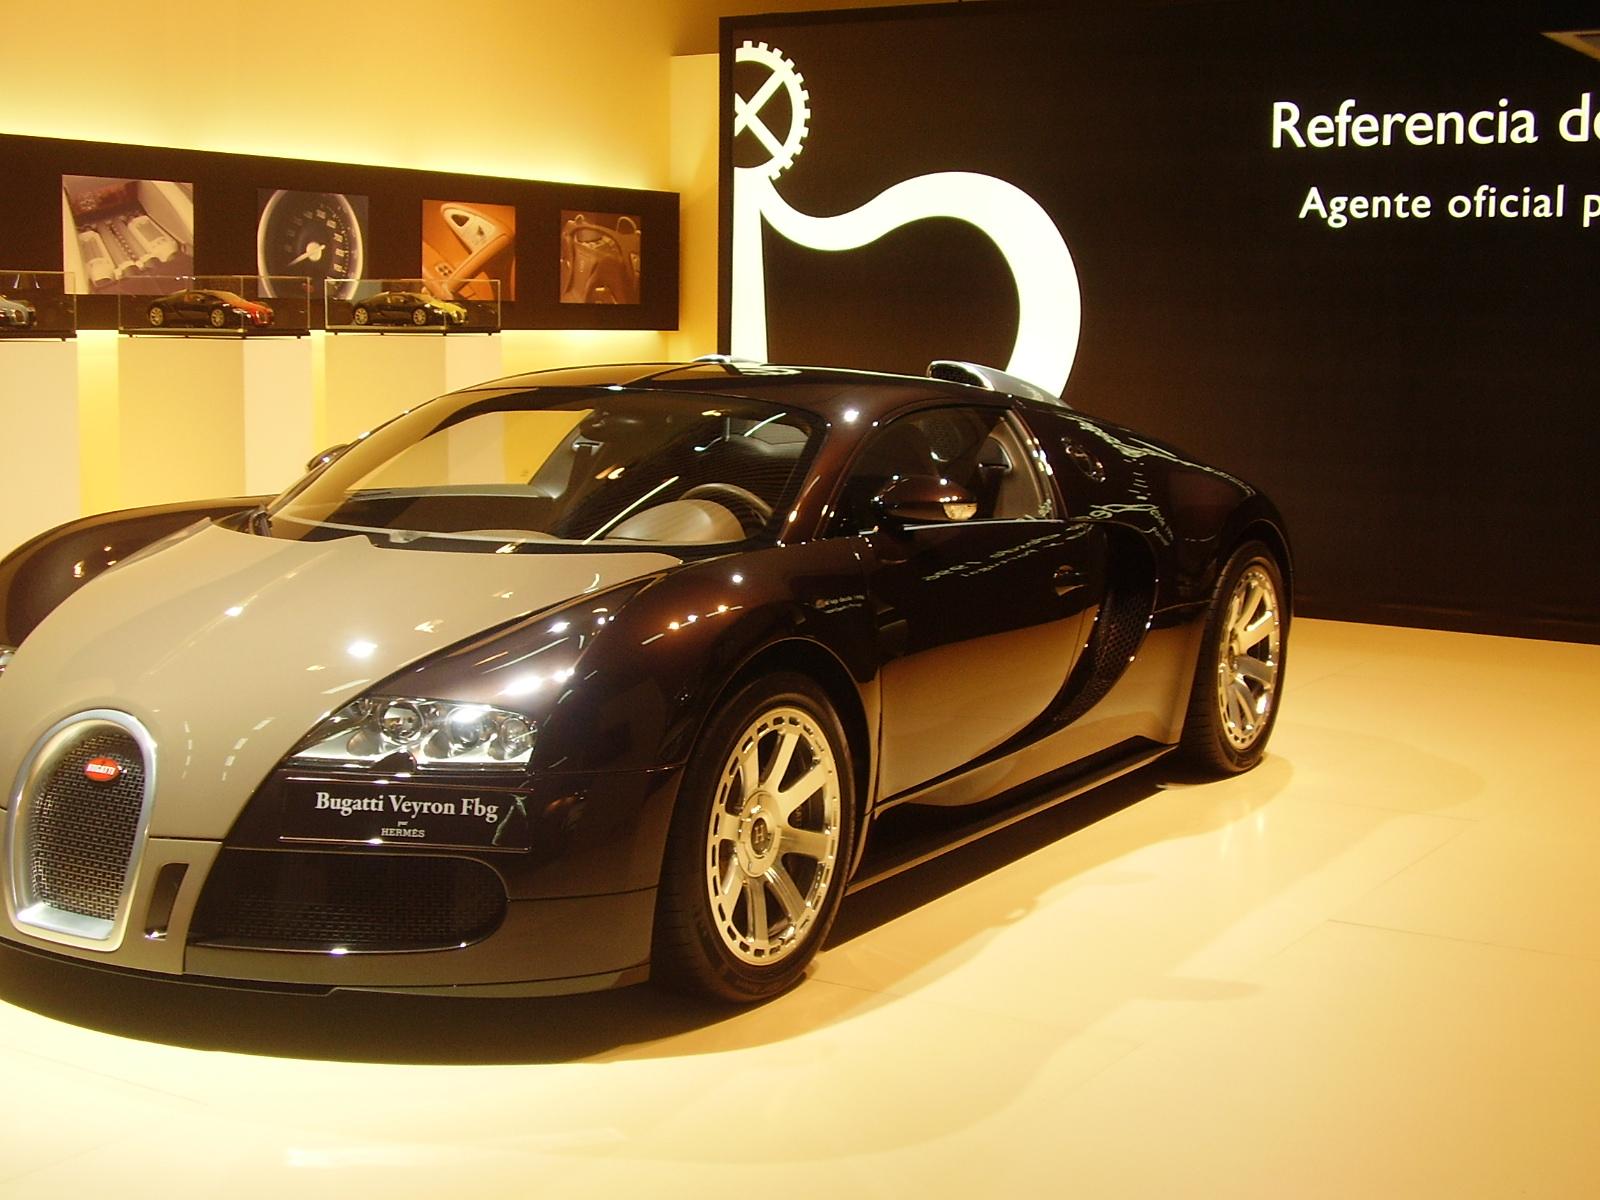 Visita Salon Automovil 09 BCN / Visit to Car Exhibition 09 Barcelona-P5140776.JPG